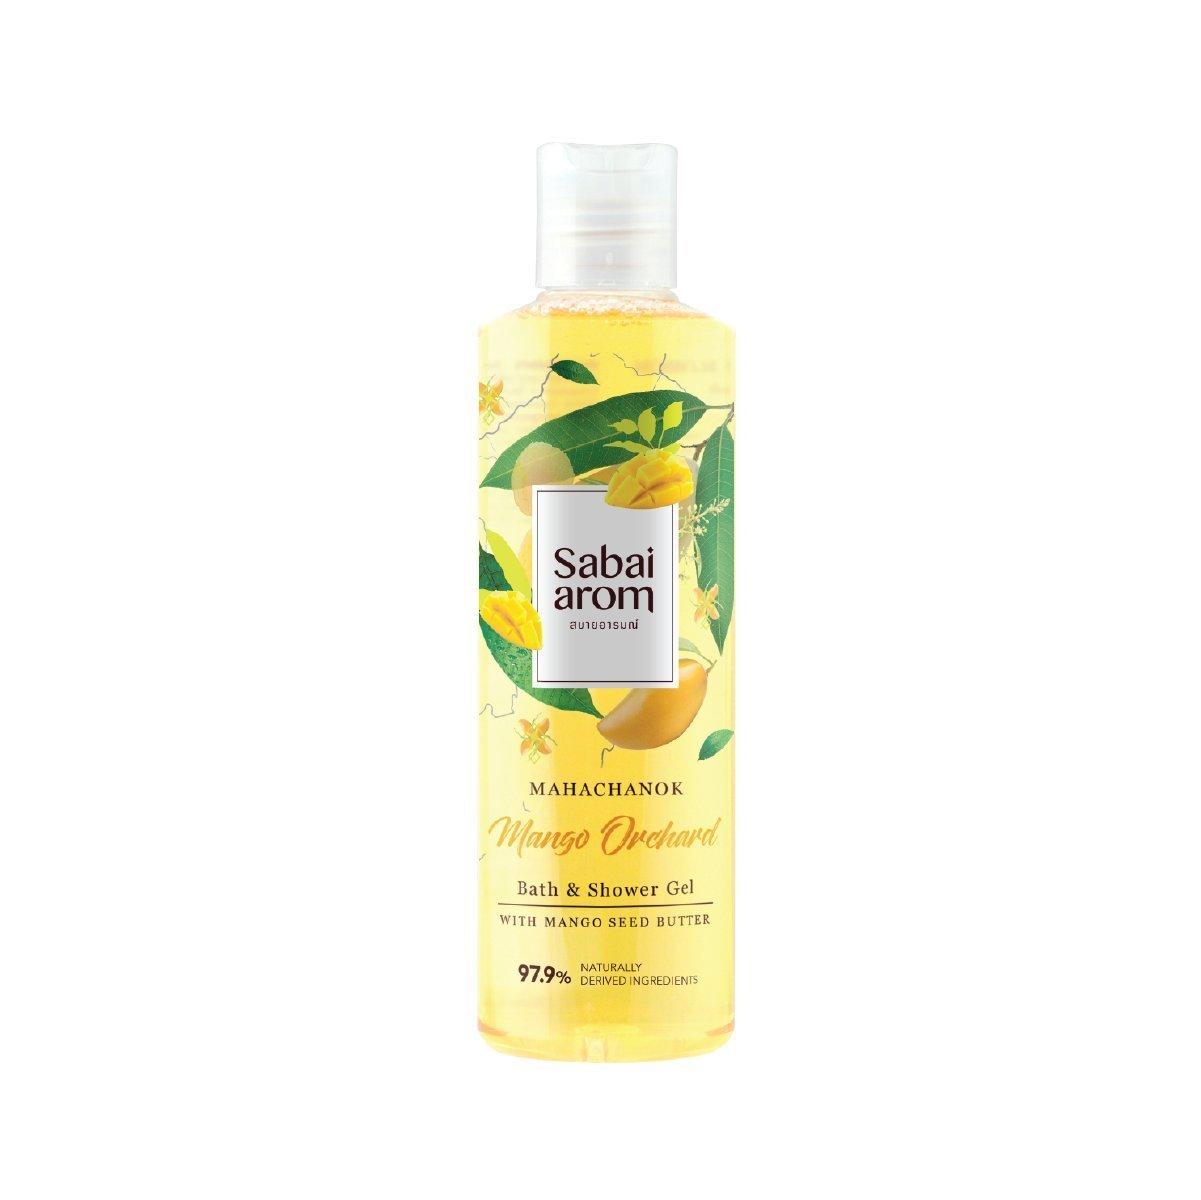 Sabai-arom Mango Orchard Bath & Shower Gel 250 ml. (3 Pack)